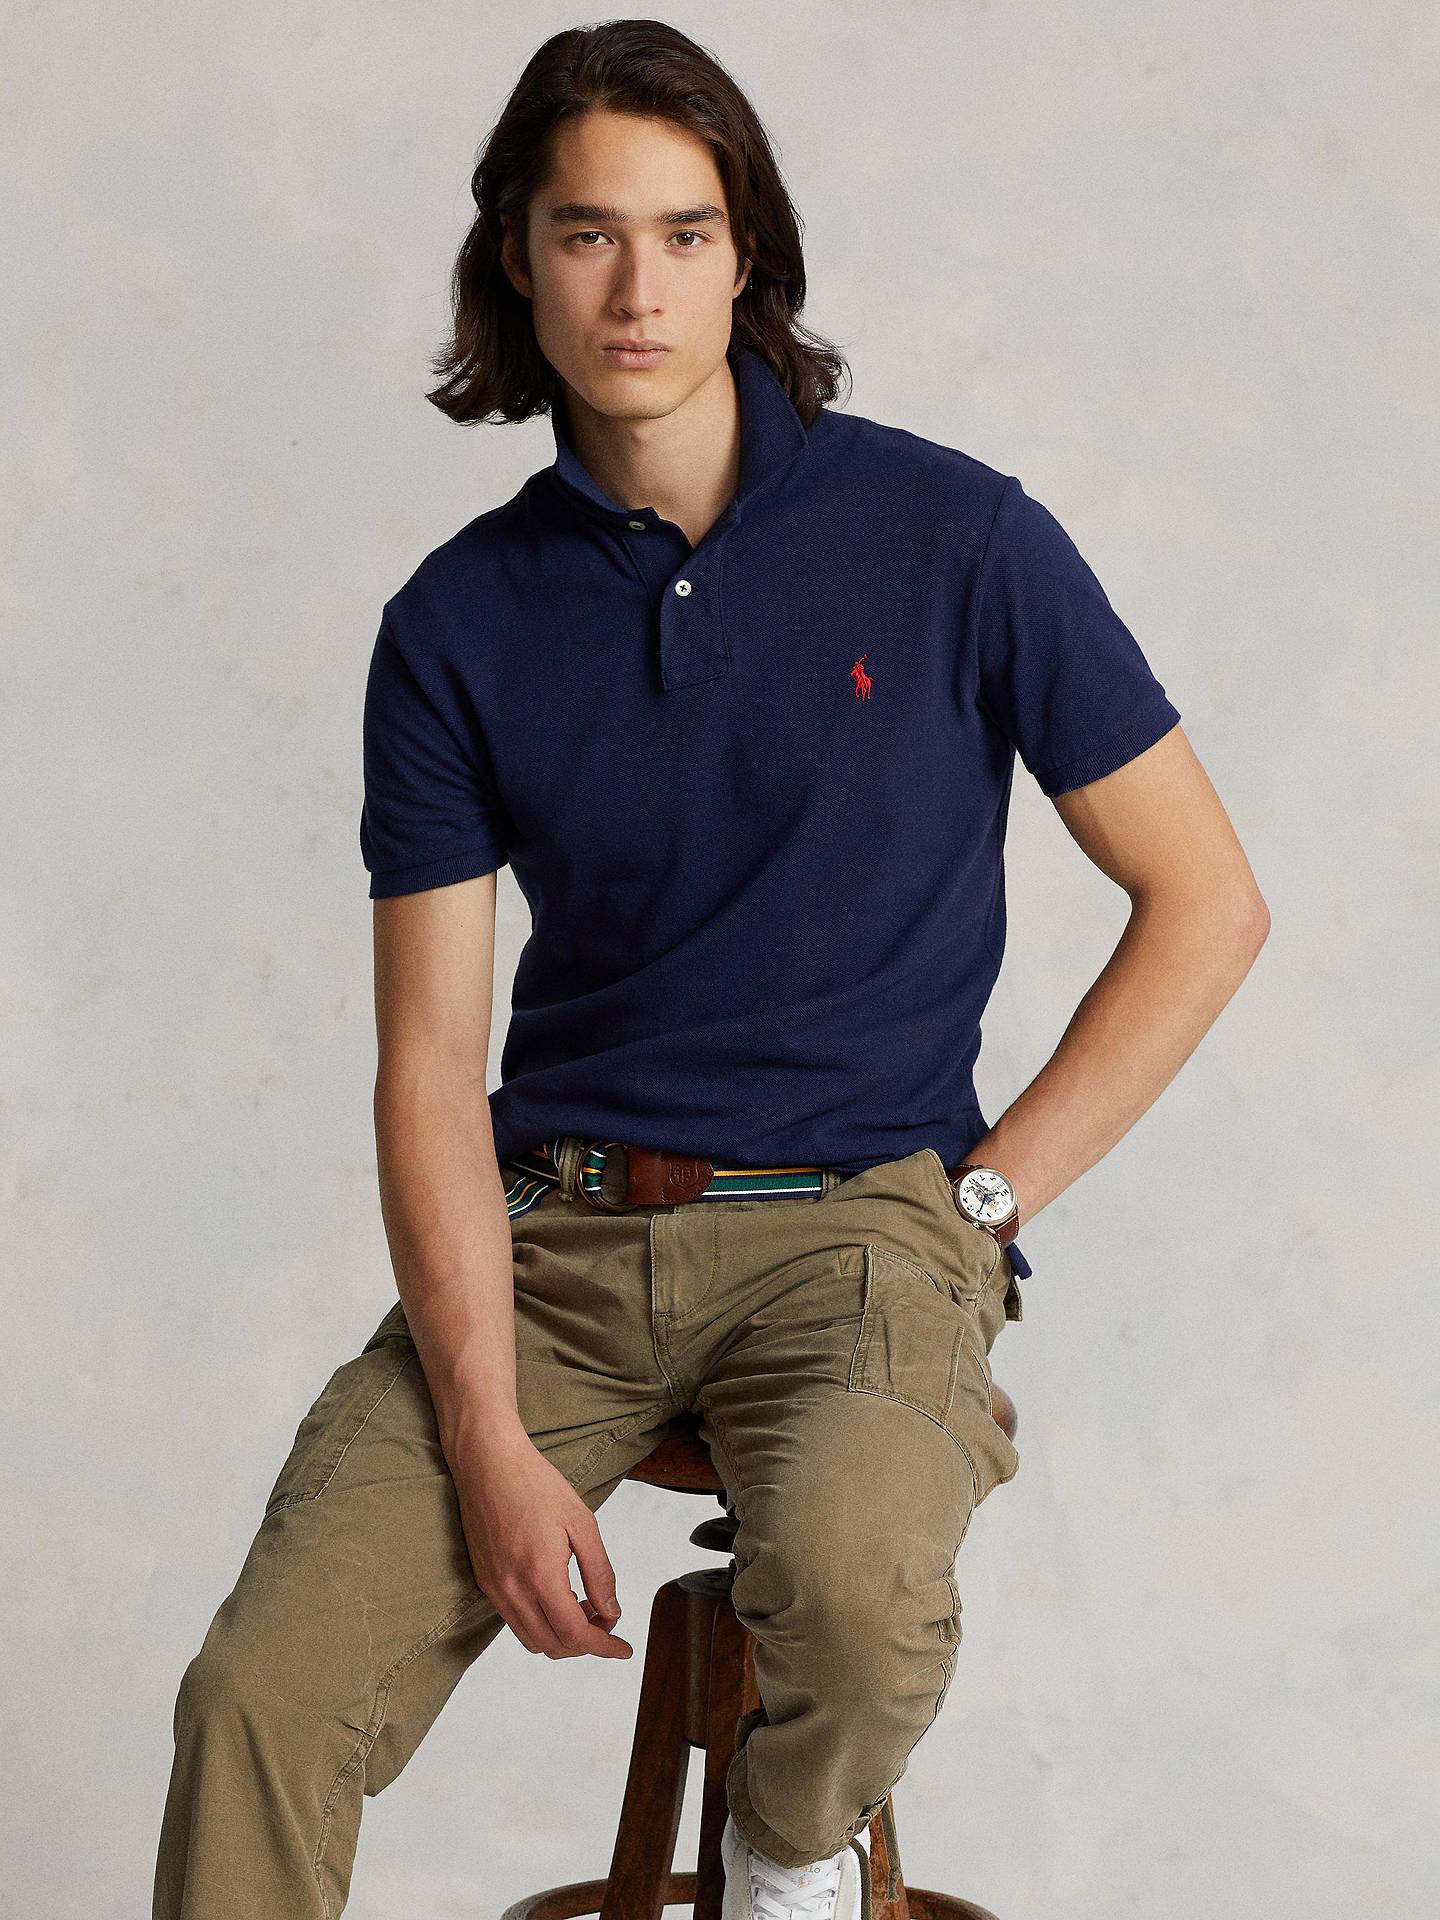 d0cfe2b8c6bdc Buy Polo Ralph Lauren Short Sleeve Slim Fit Polo Shirt